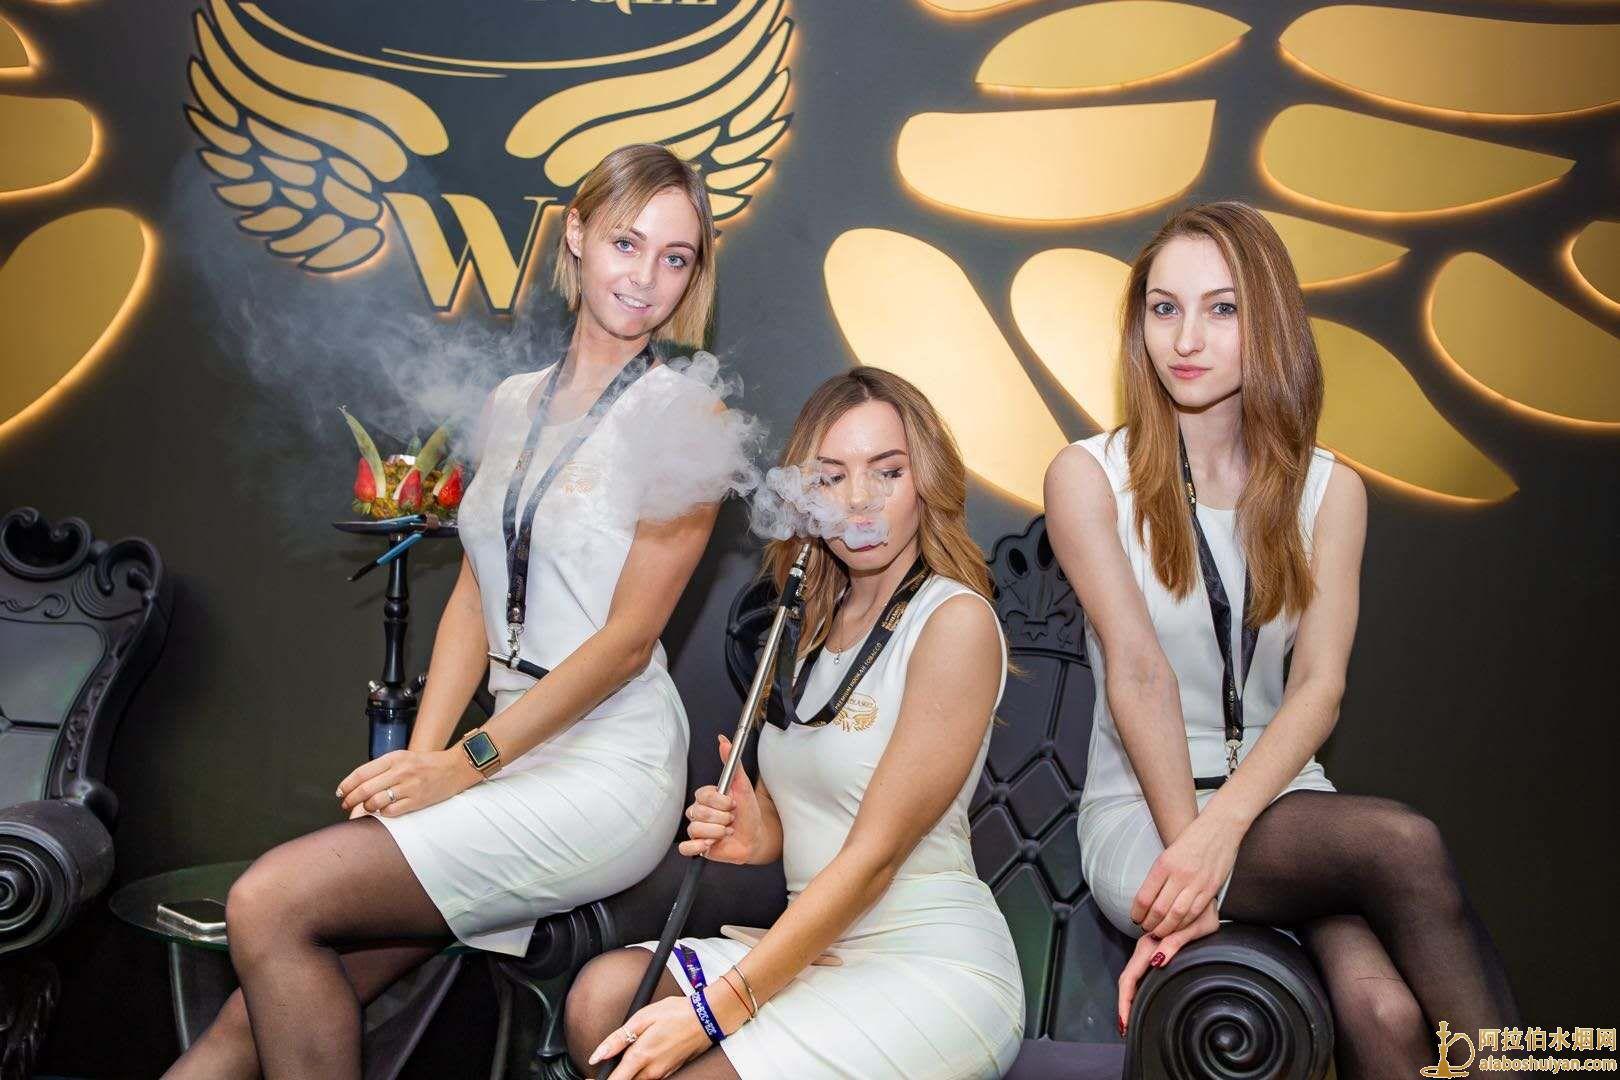 White angel白色天使水烟膏50克土耳其进口烟膏批发价格中国总代理